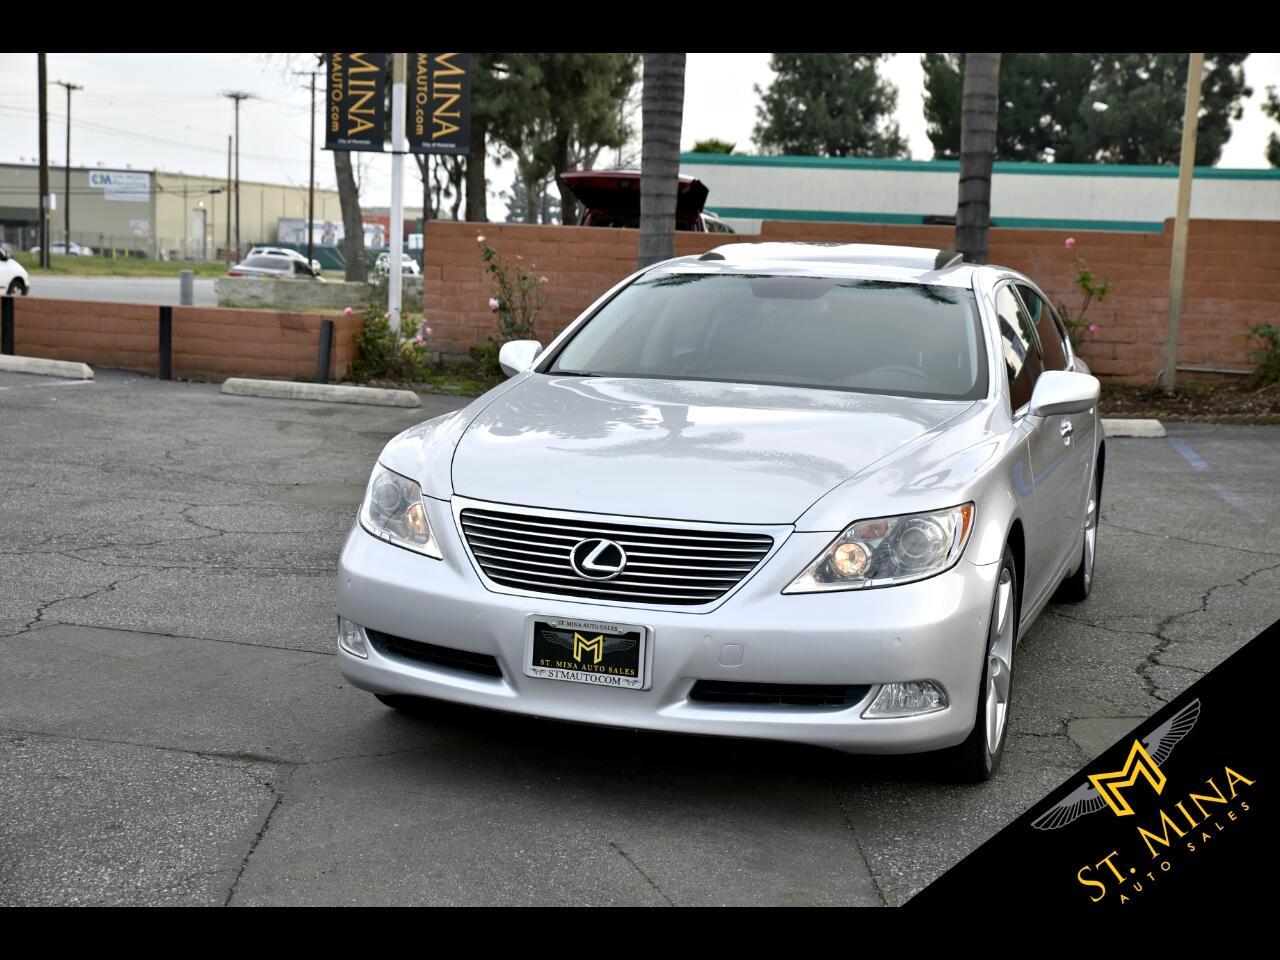 2008 Lexus LS 460 L Luxury Sedan